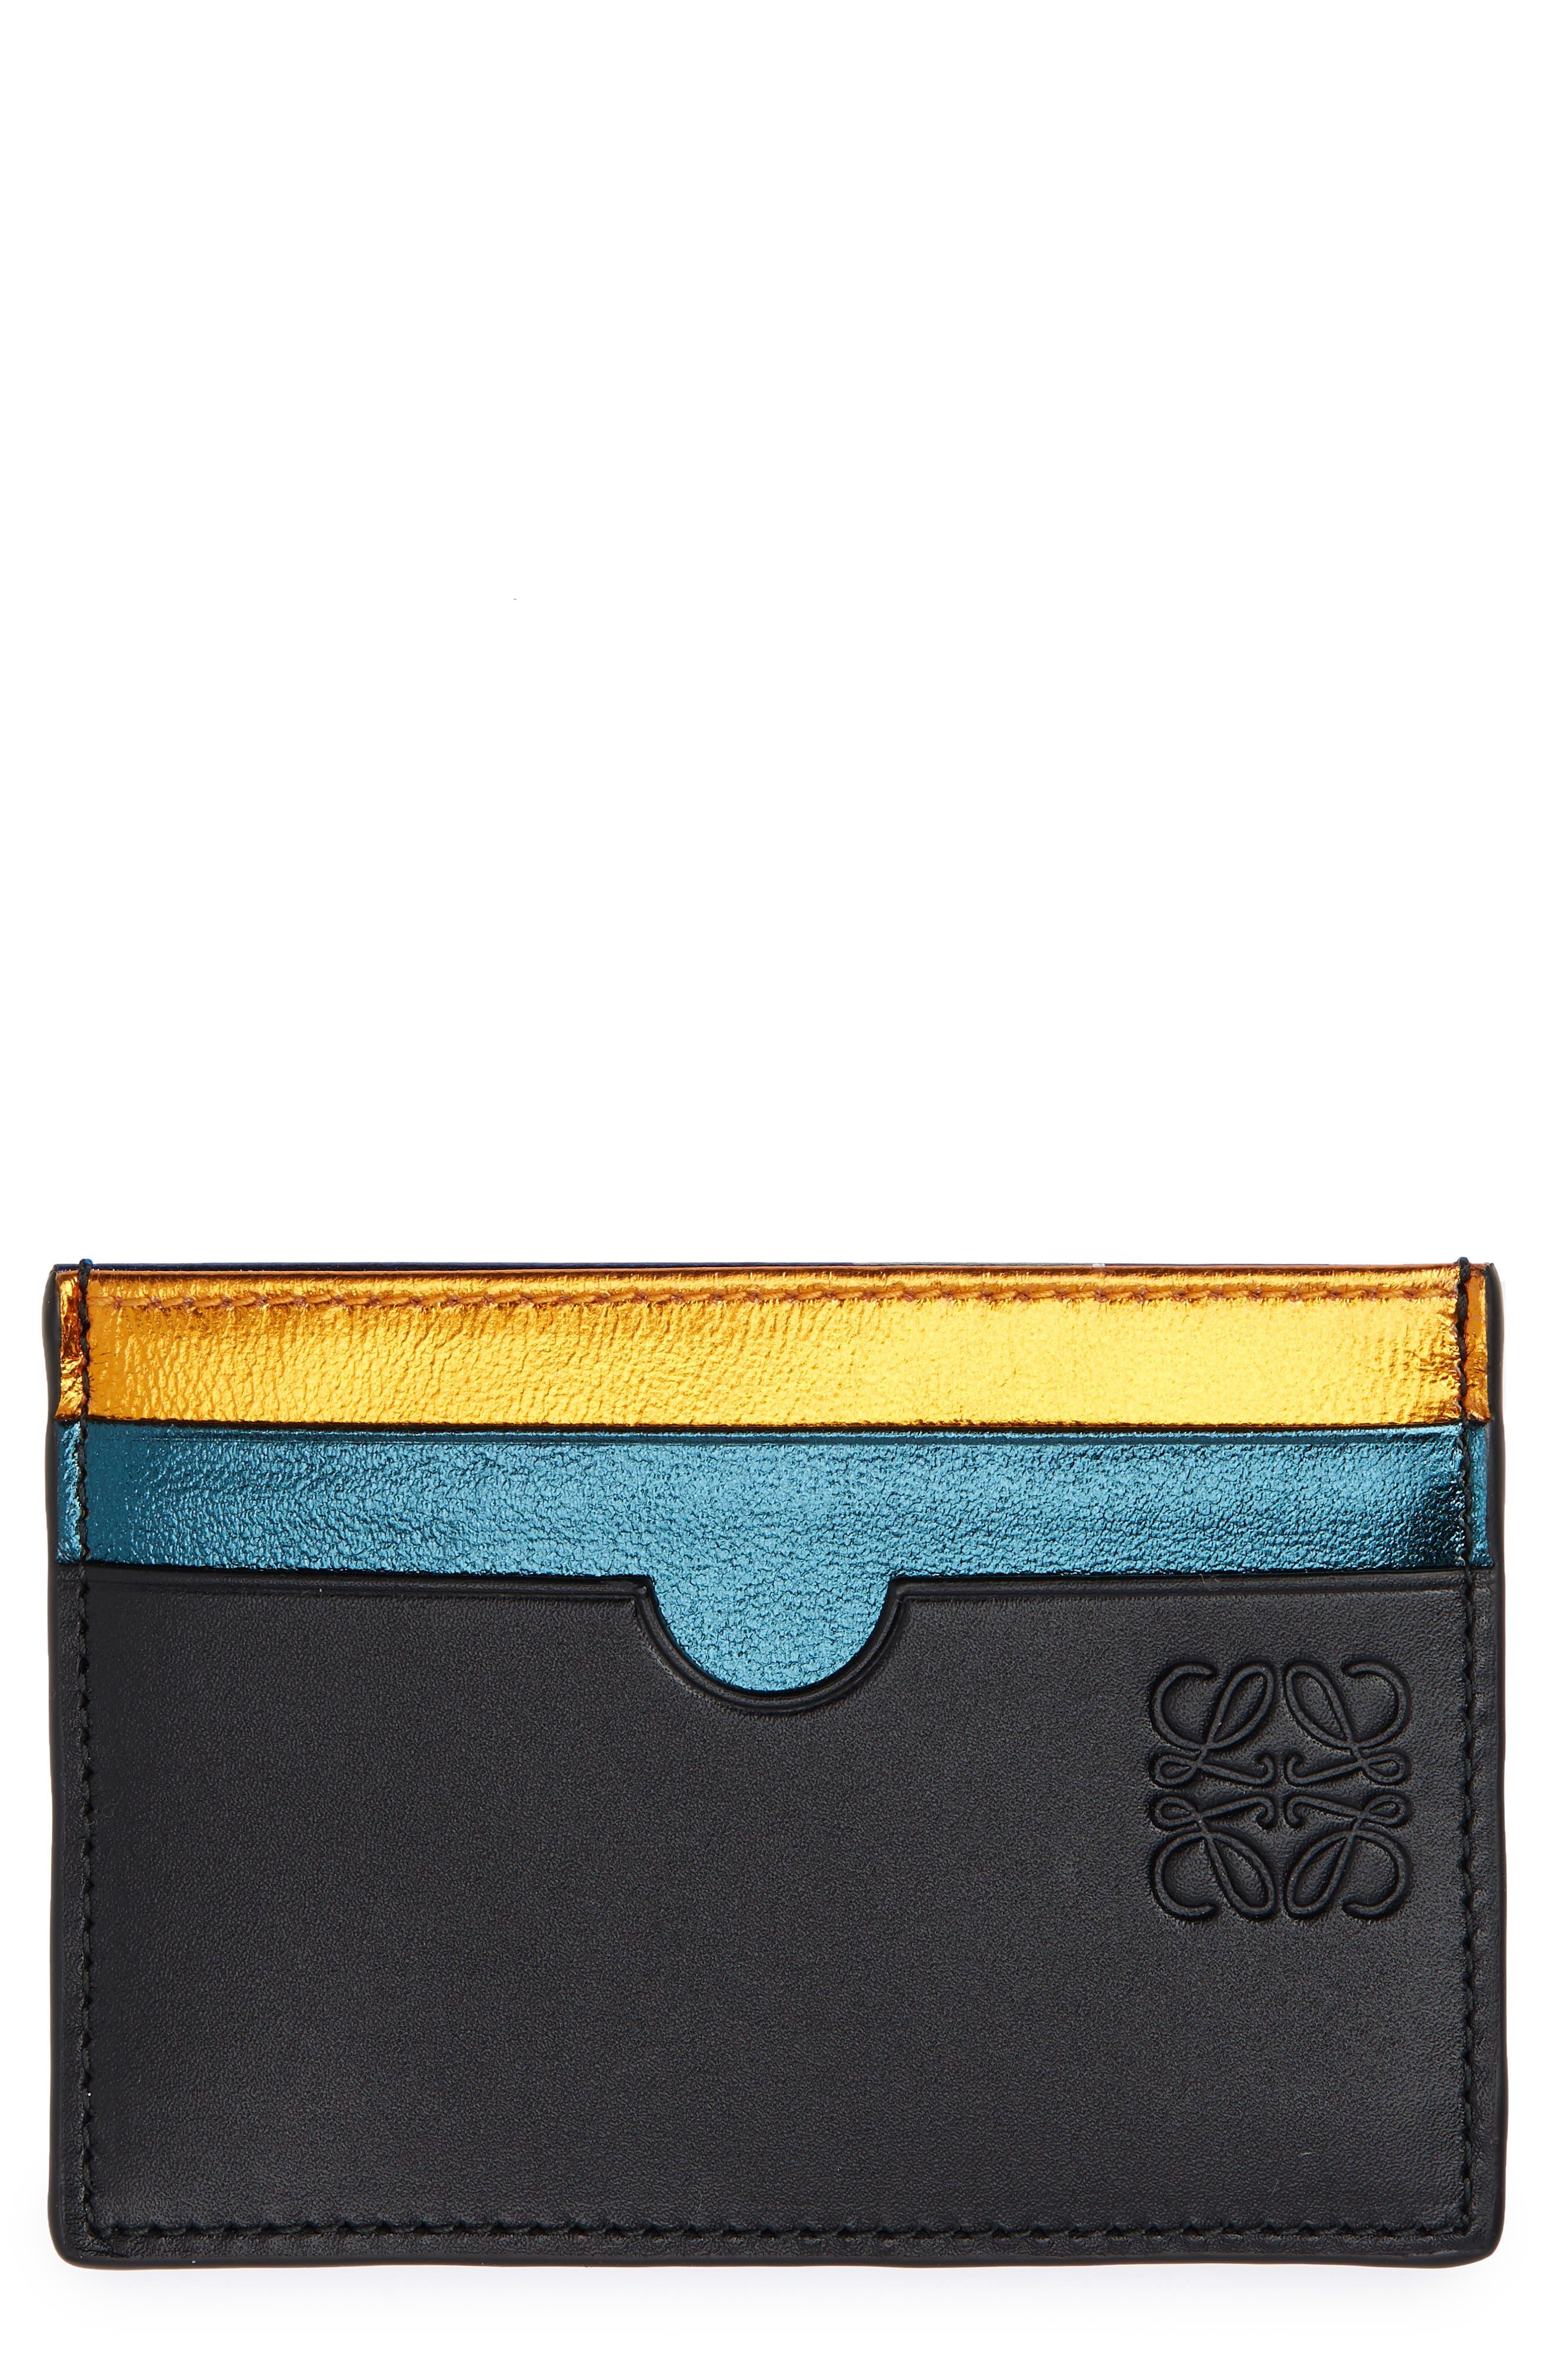 Rainbow Plain Card Case,                             Main thumbnail 1, color,                             METALLIC BLACK MULTI